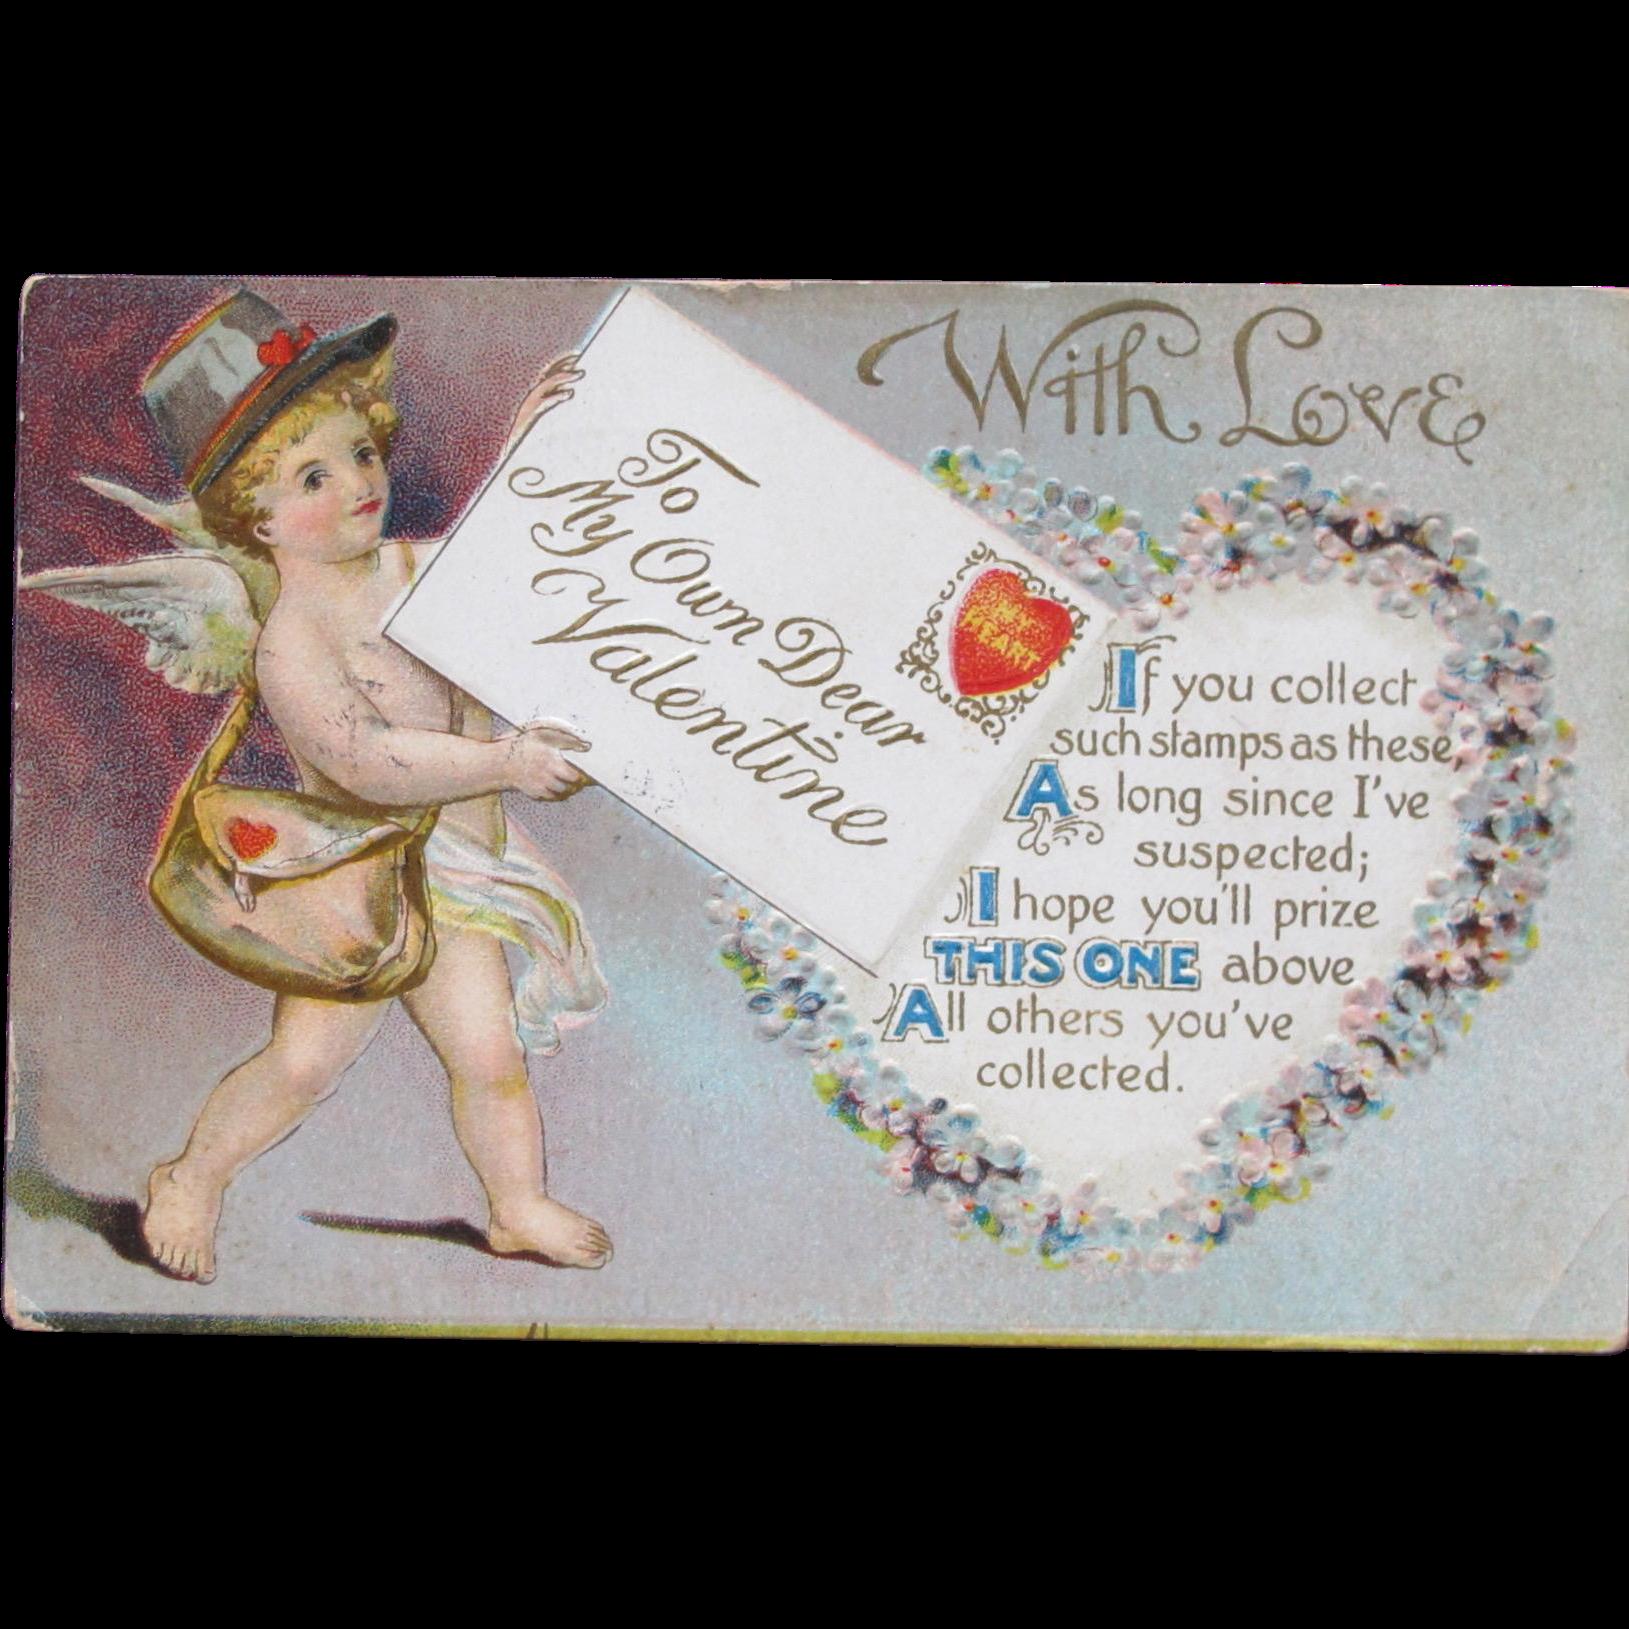 Valentine's Day Post Card 1910 Embossed w/ Cherub